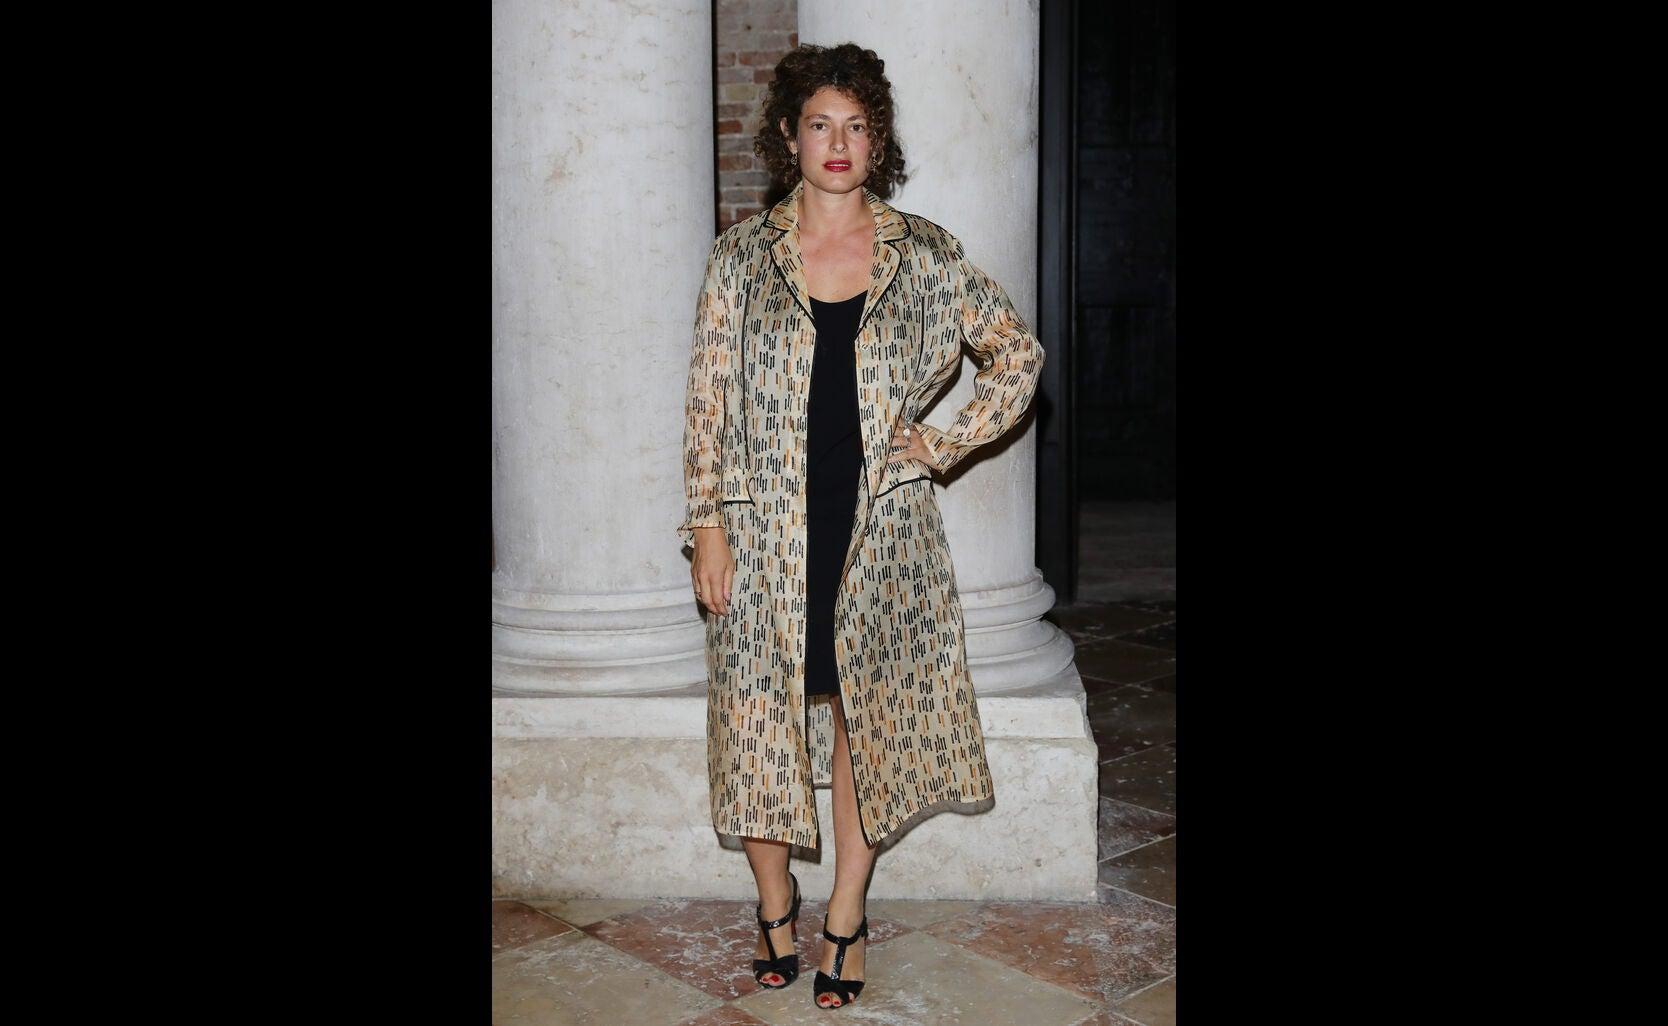 Ginevra Elkann at 2016 Venice Film Festival